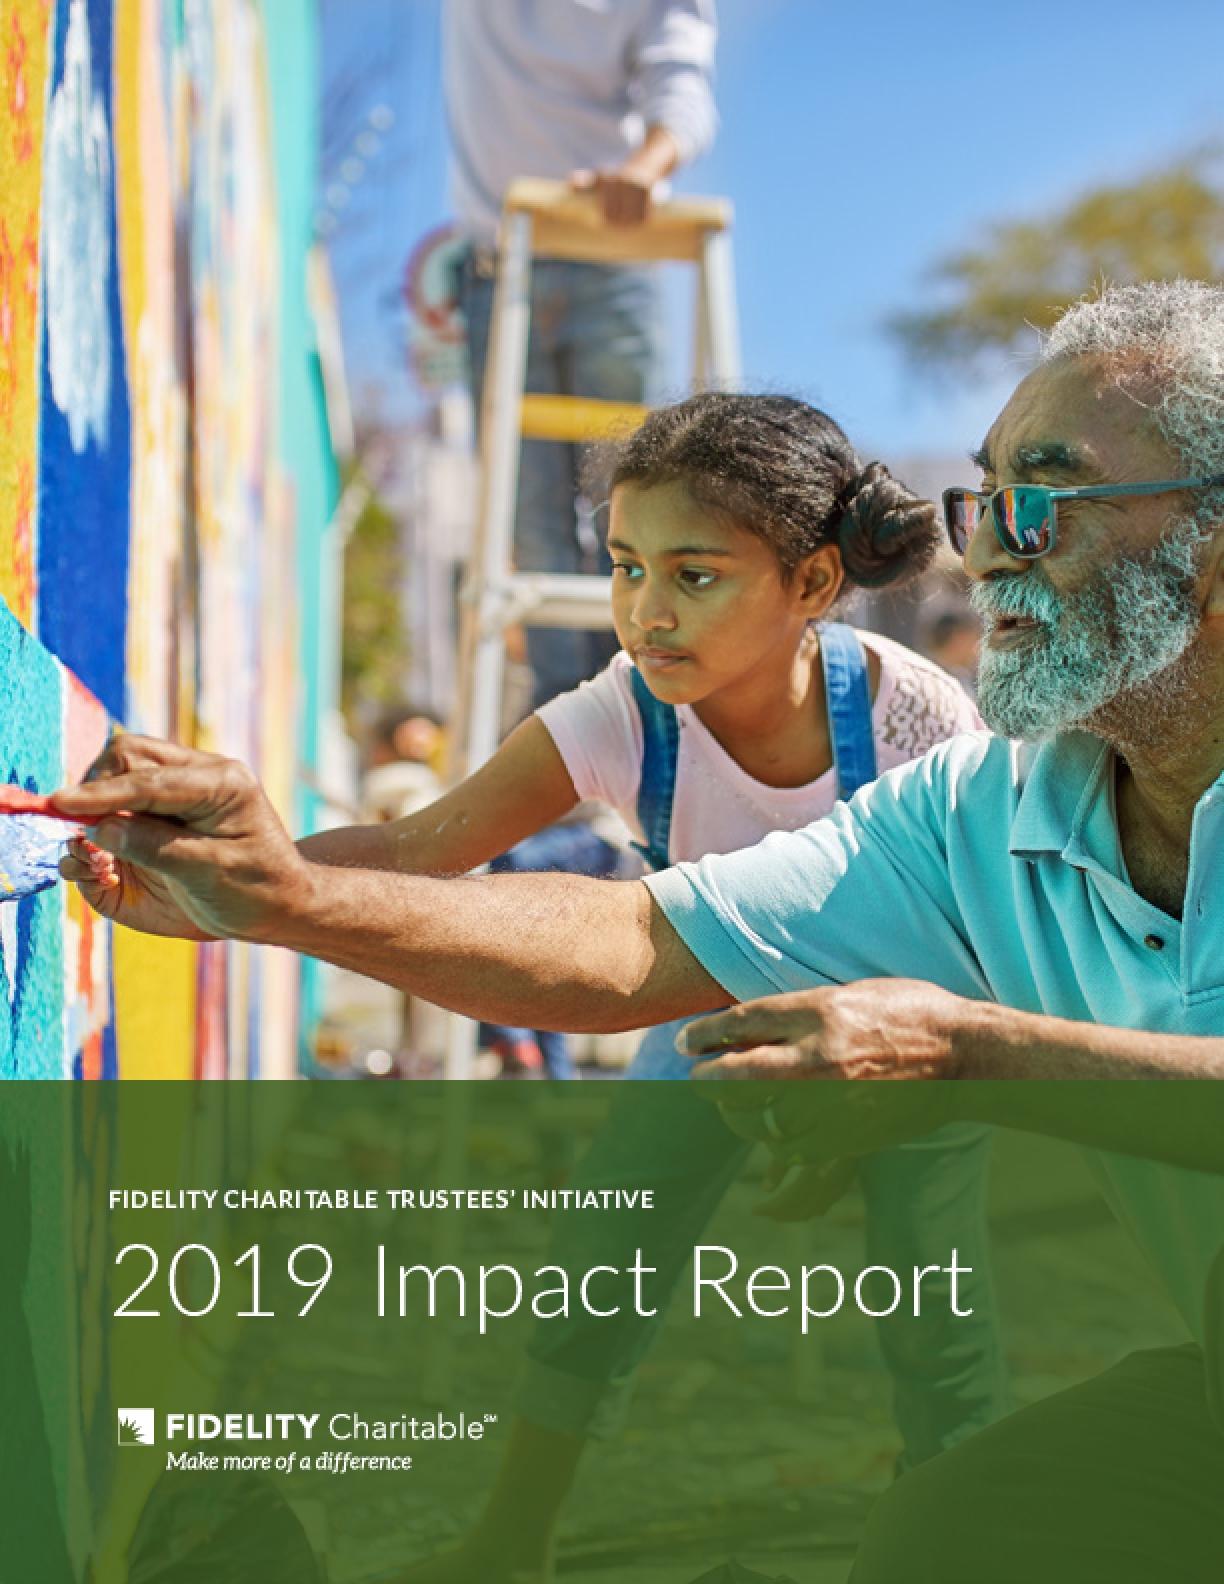 Fidelity Charitable Trustees' Initiative 2019 Impact Report